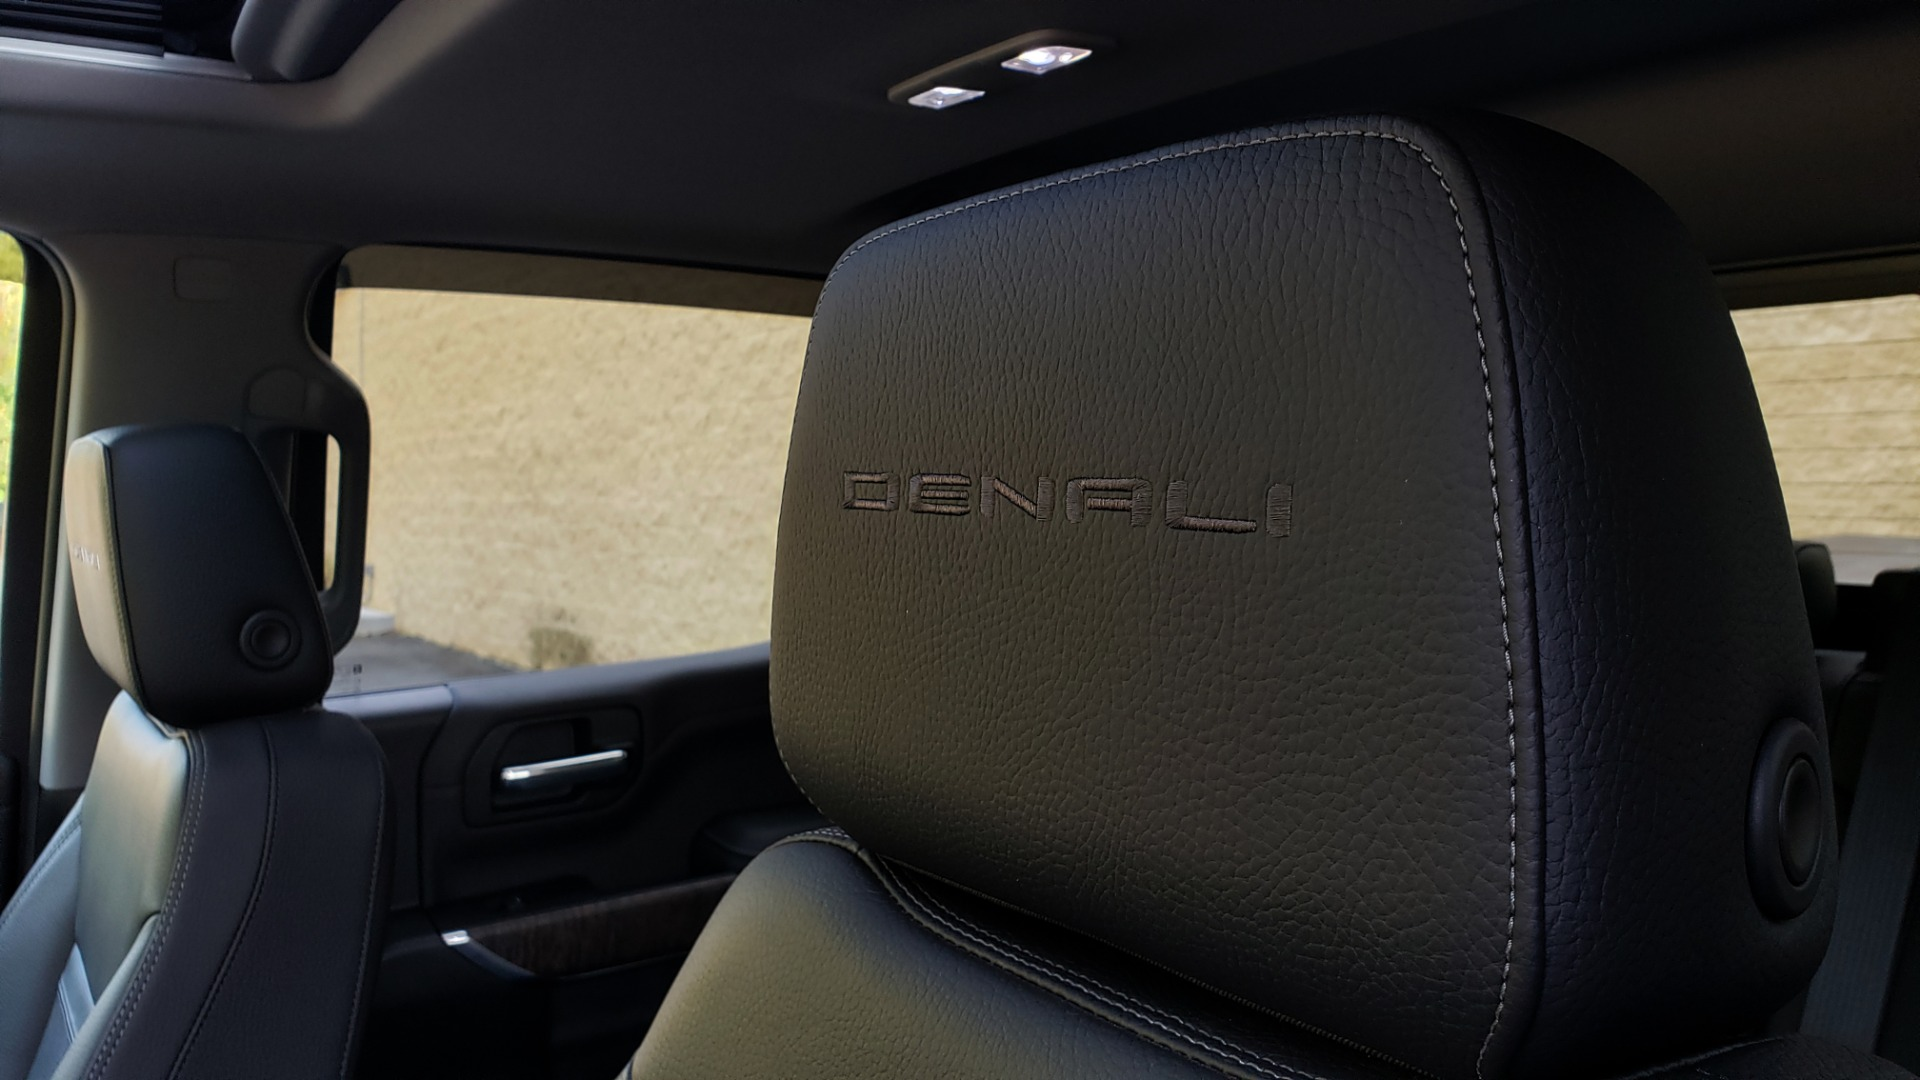 Used 2019 GMC SIERRA 1500 DENALI ULTIMATE 4WD / NAV / TECH PKG / DRVR ALRT for sale Sold at Formula Imports in Charlotte NC 28227 48